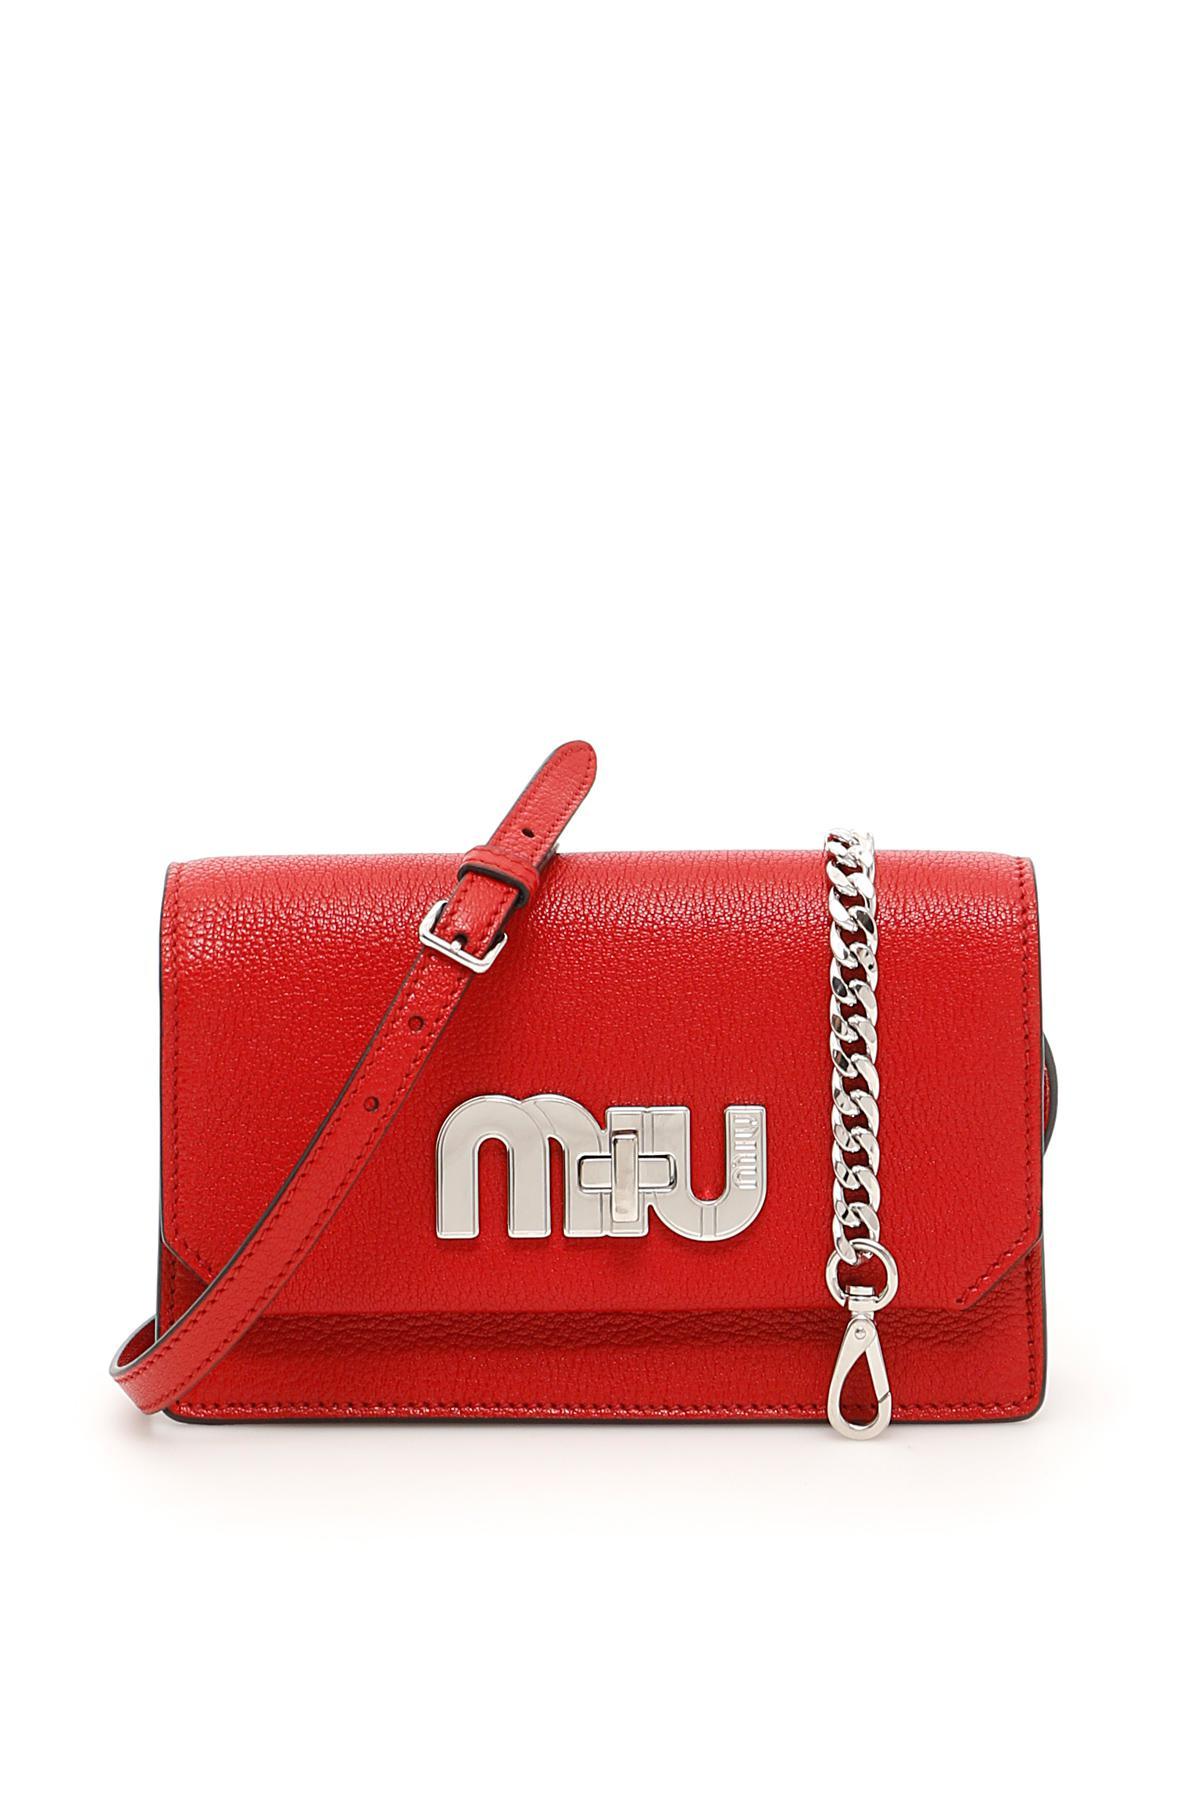 980eb86f733 Lyst - Miu Miu Miu Logo Madras Bag in Red